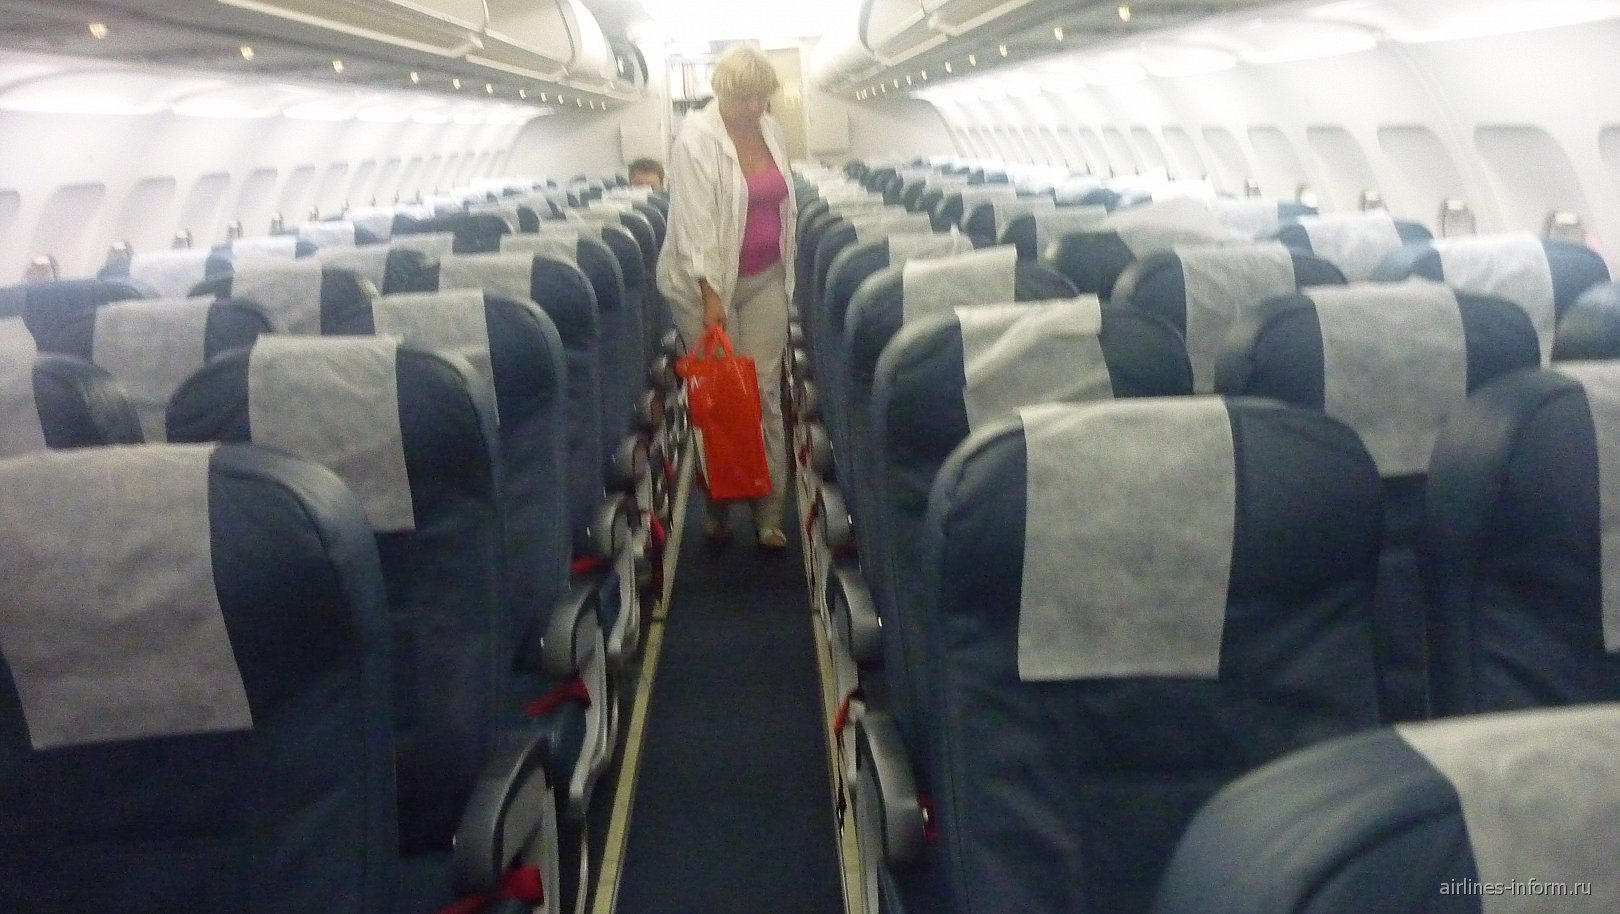 Салон самолета Airbus A319 авиакомпании Air Malta